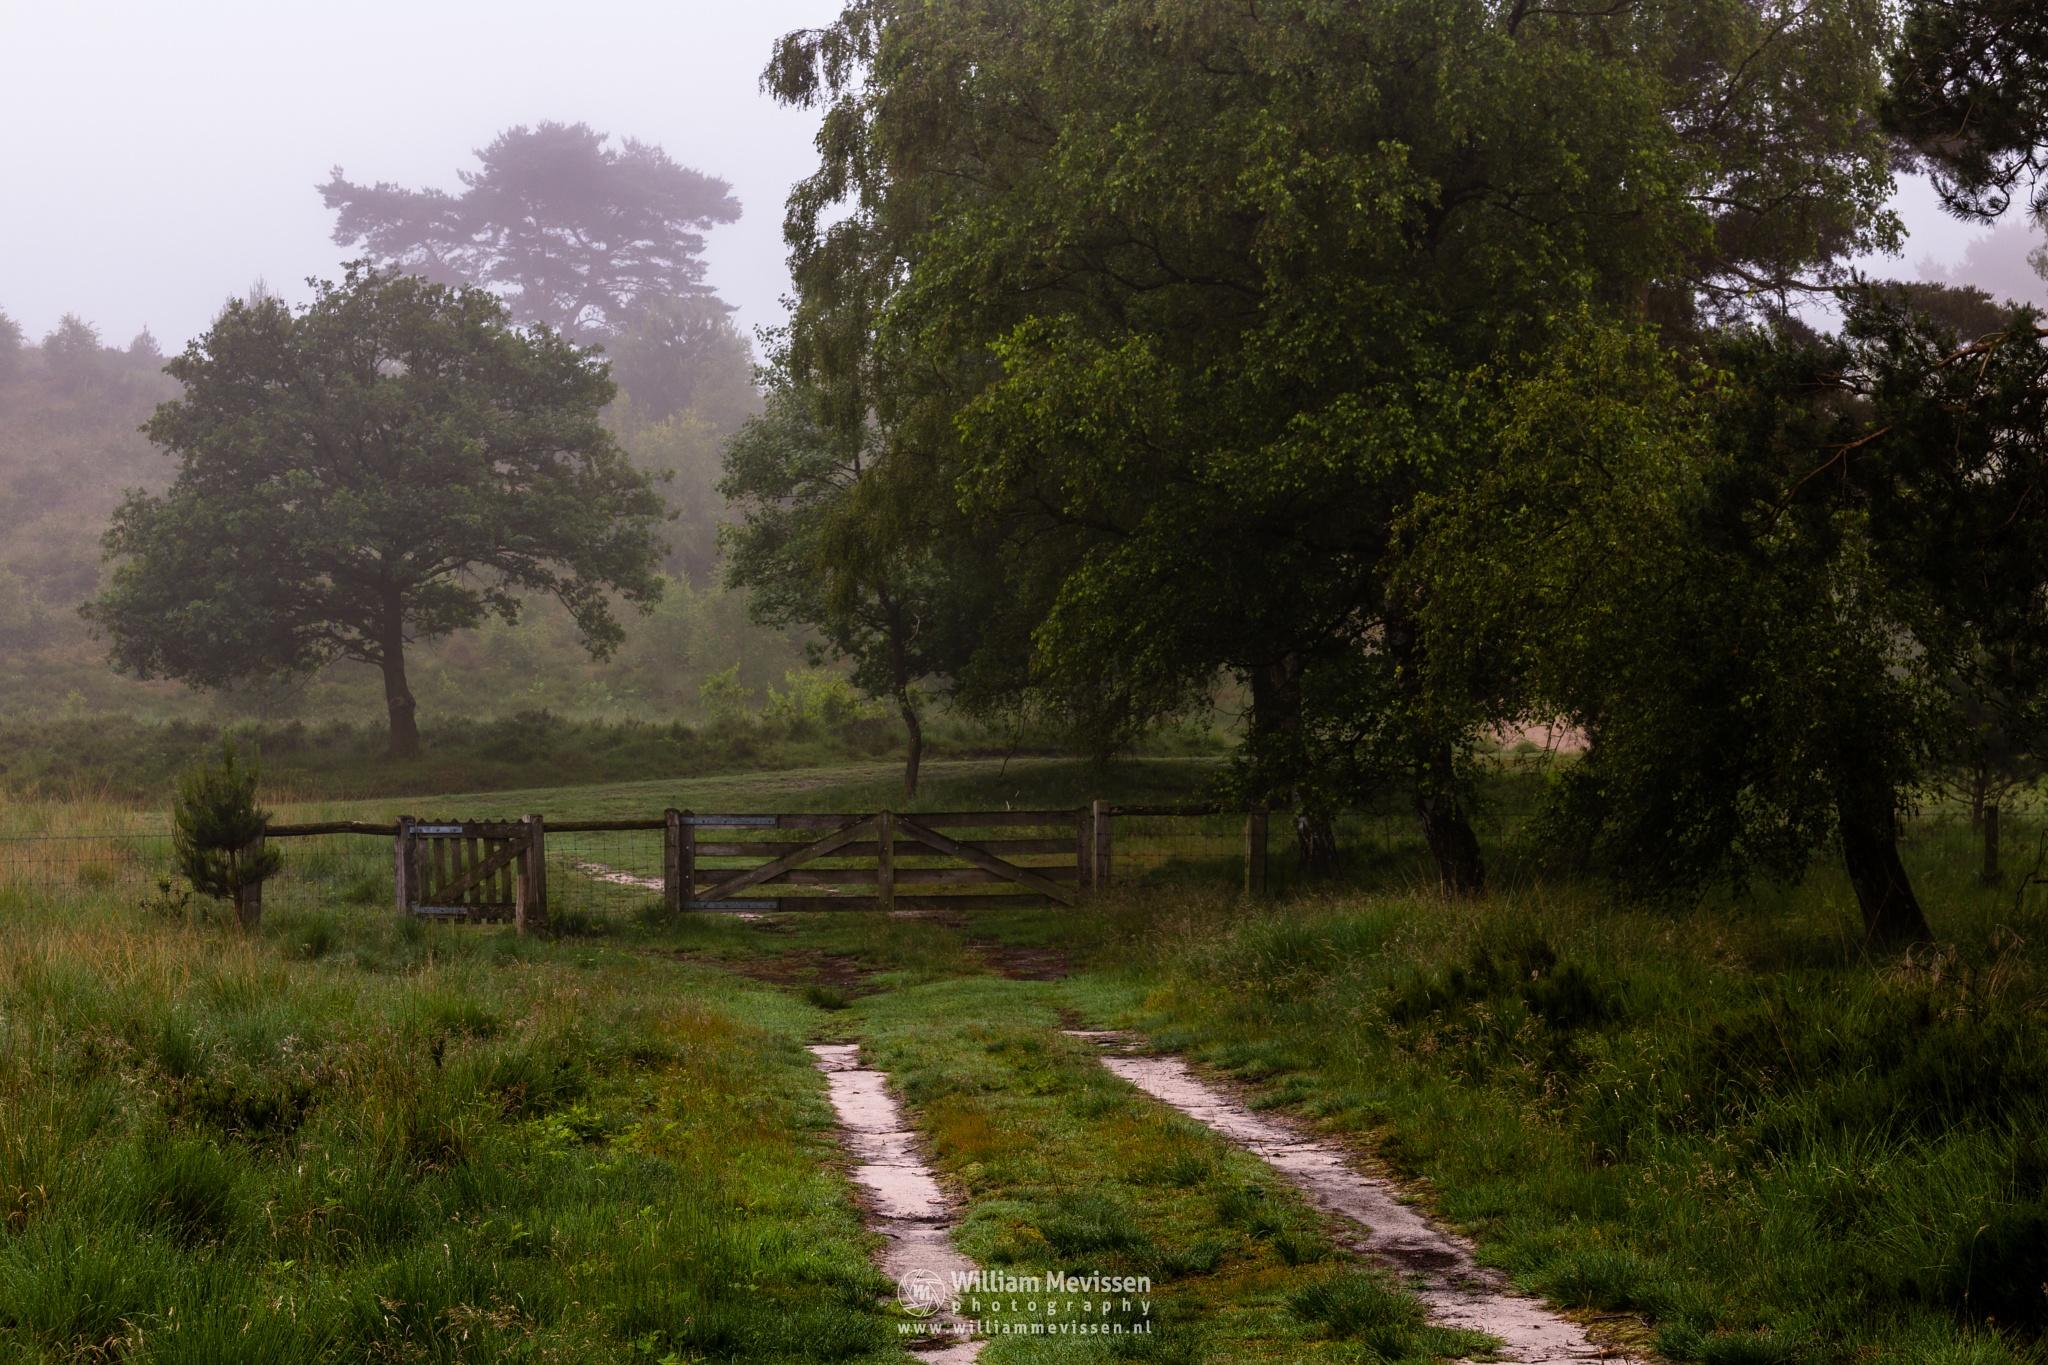 Foggy Morning Gate by William Mevissen